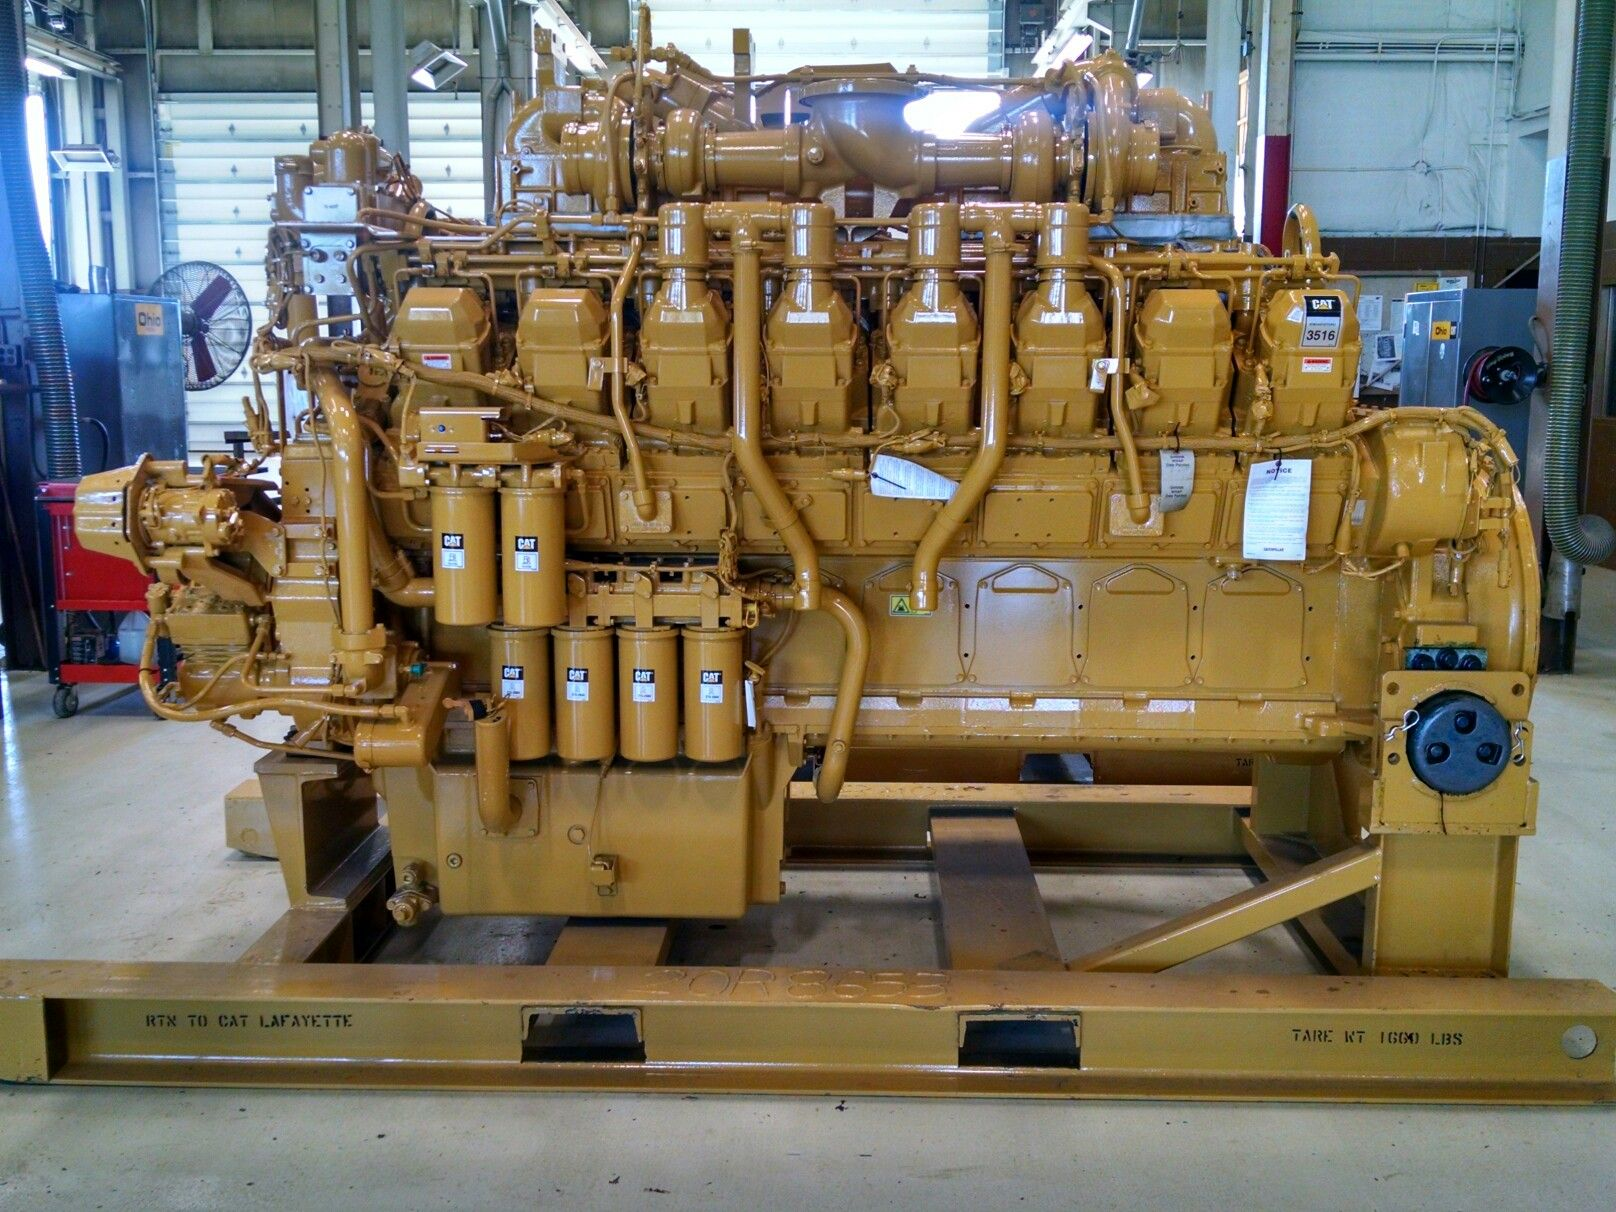 789 truck engine 3516 old cat equipment pinterest truck engine rh pinterest com Caterpillar 3516 Engine Specifications Cat 3516 Generator